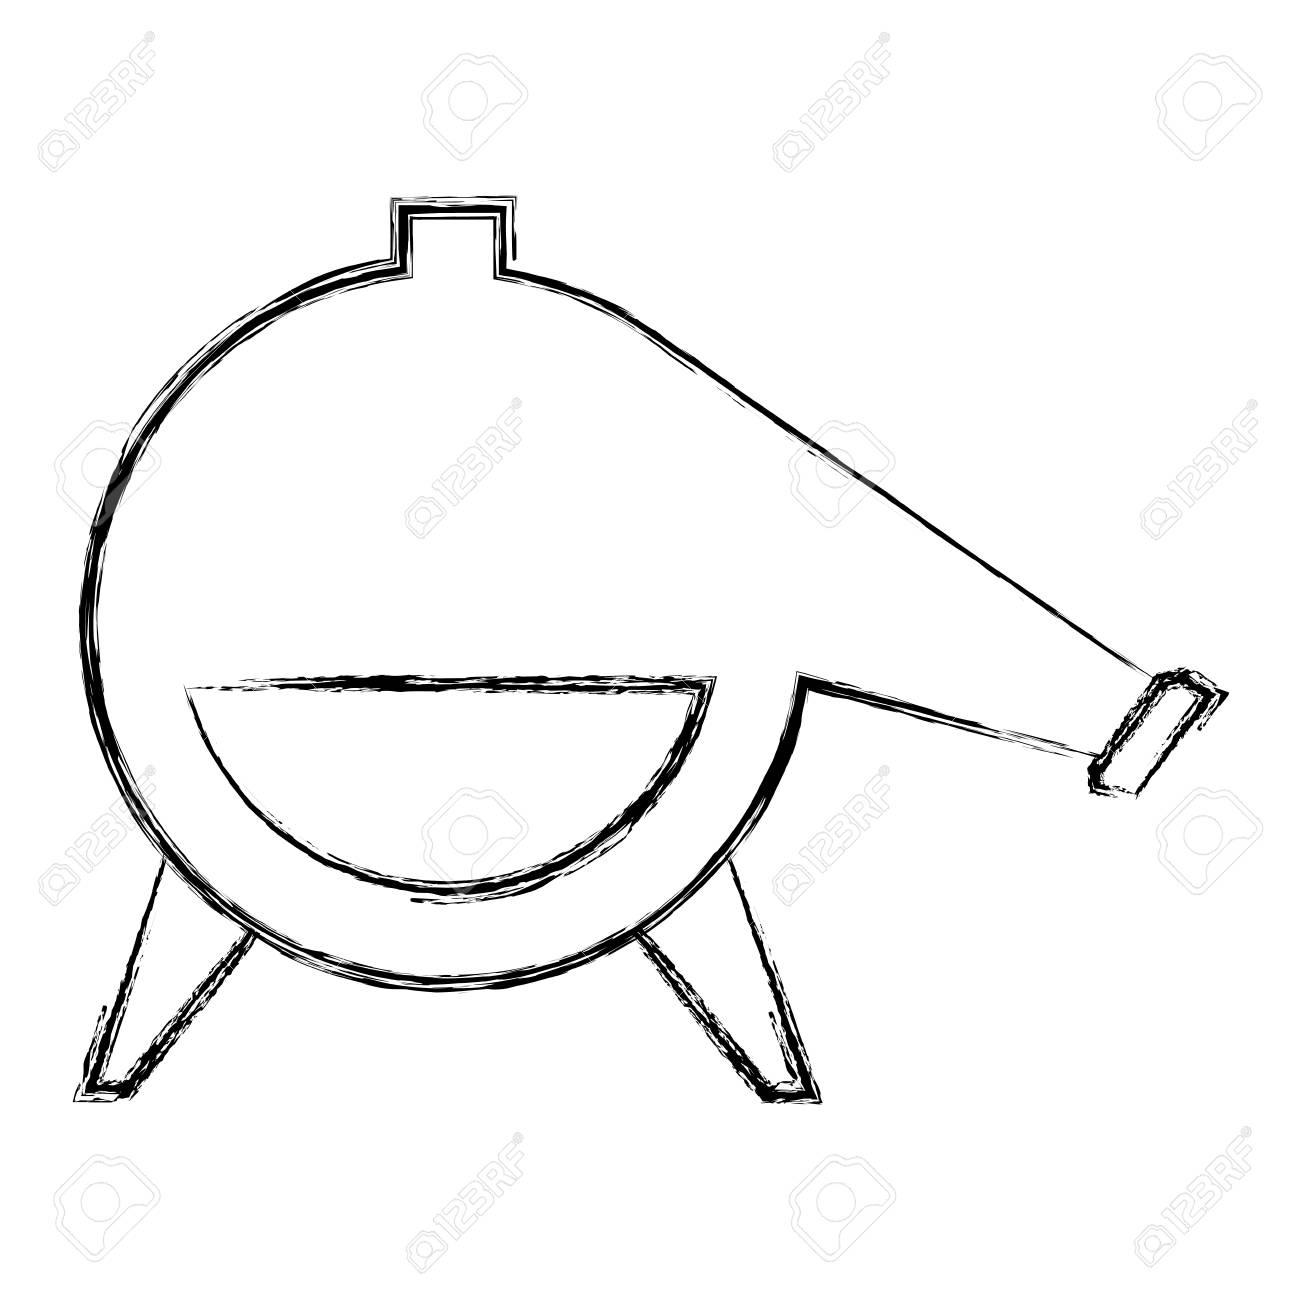 1300x1300 Distillation Flask Chemistry Icon Vector Illustration Graphic